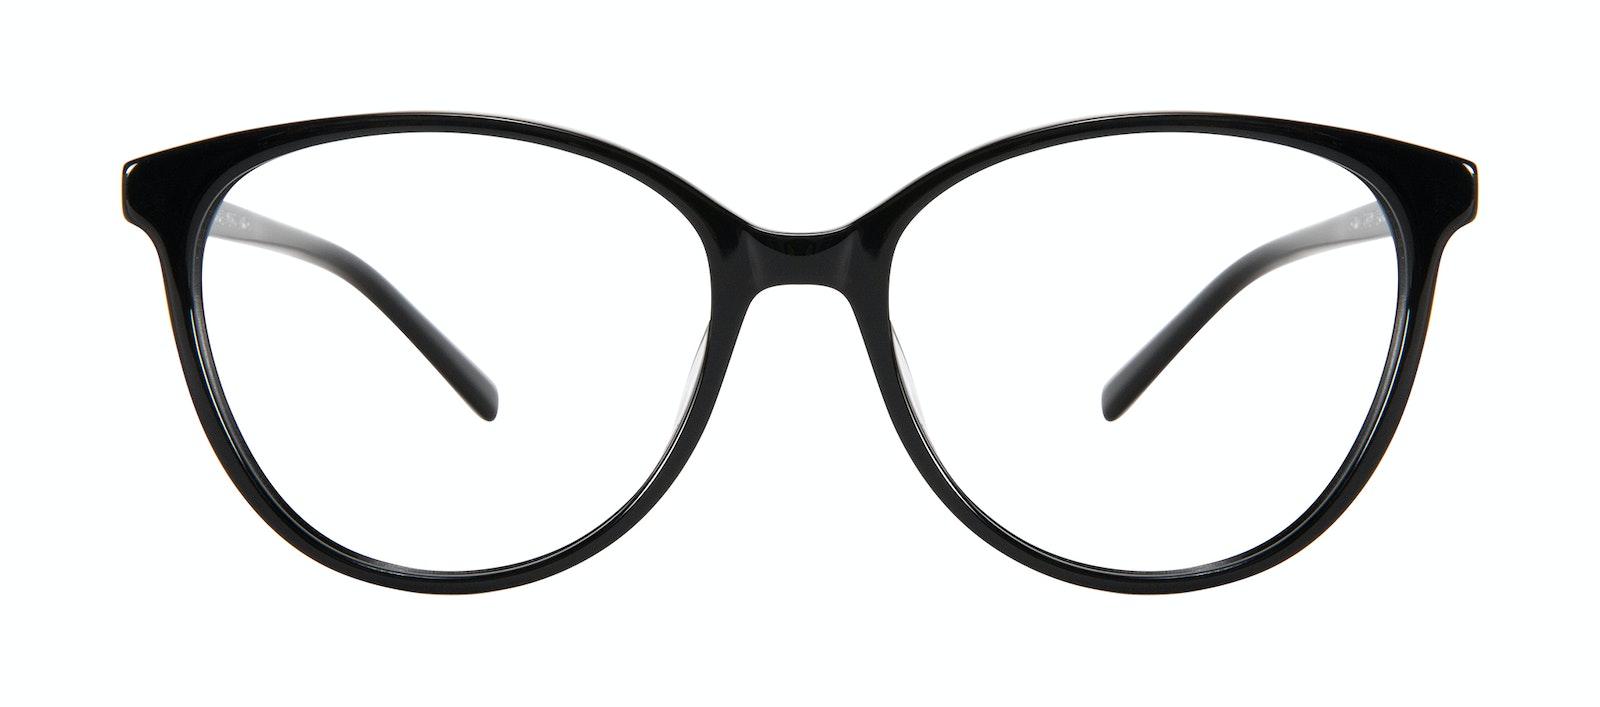 Affordable Fashion Glasses Cat Eye Eyeglasses Women Imagine Plus Onyx Front